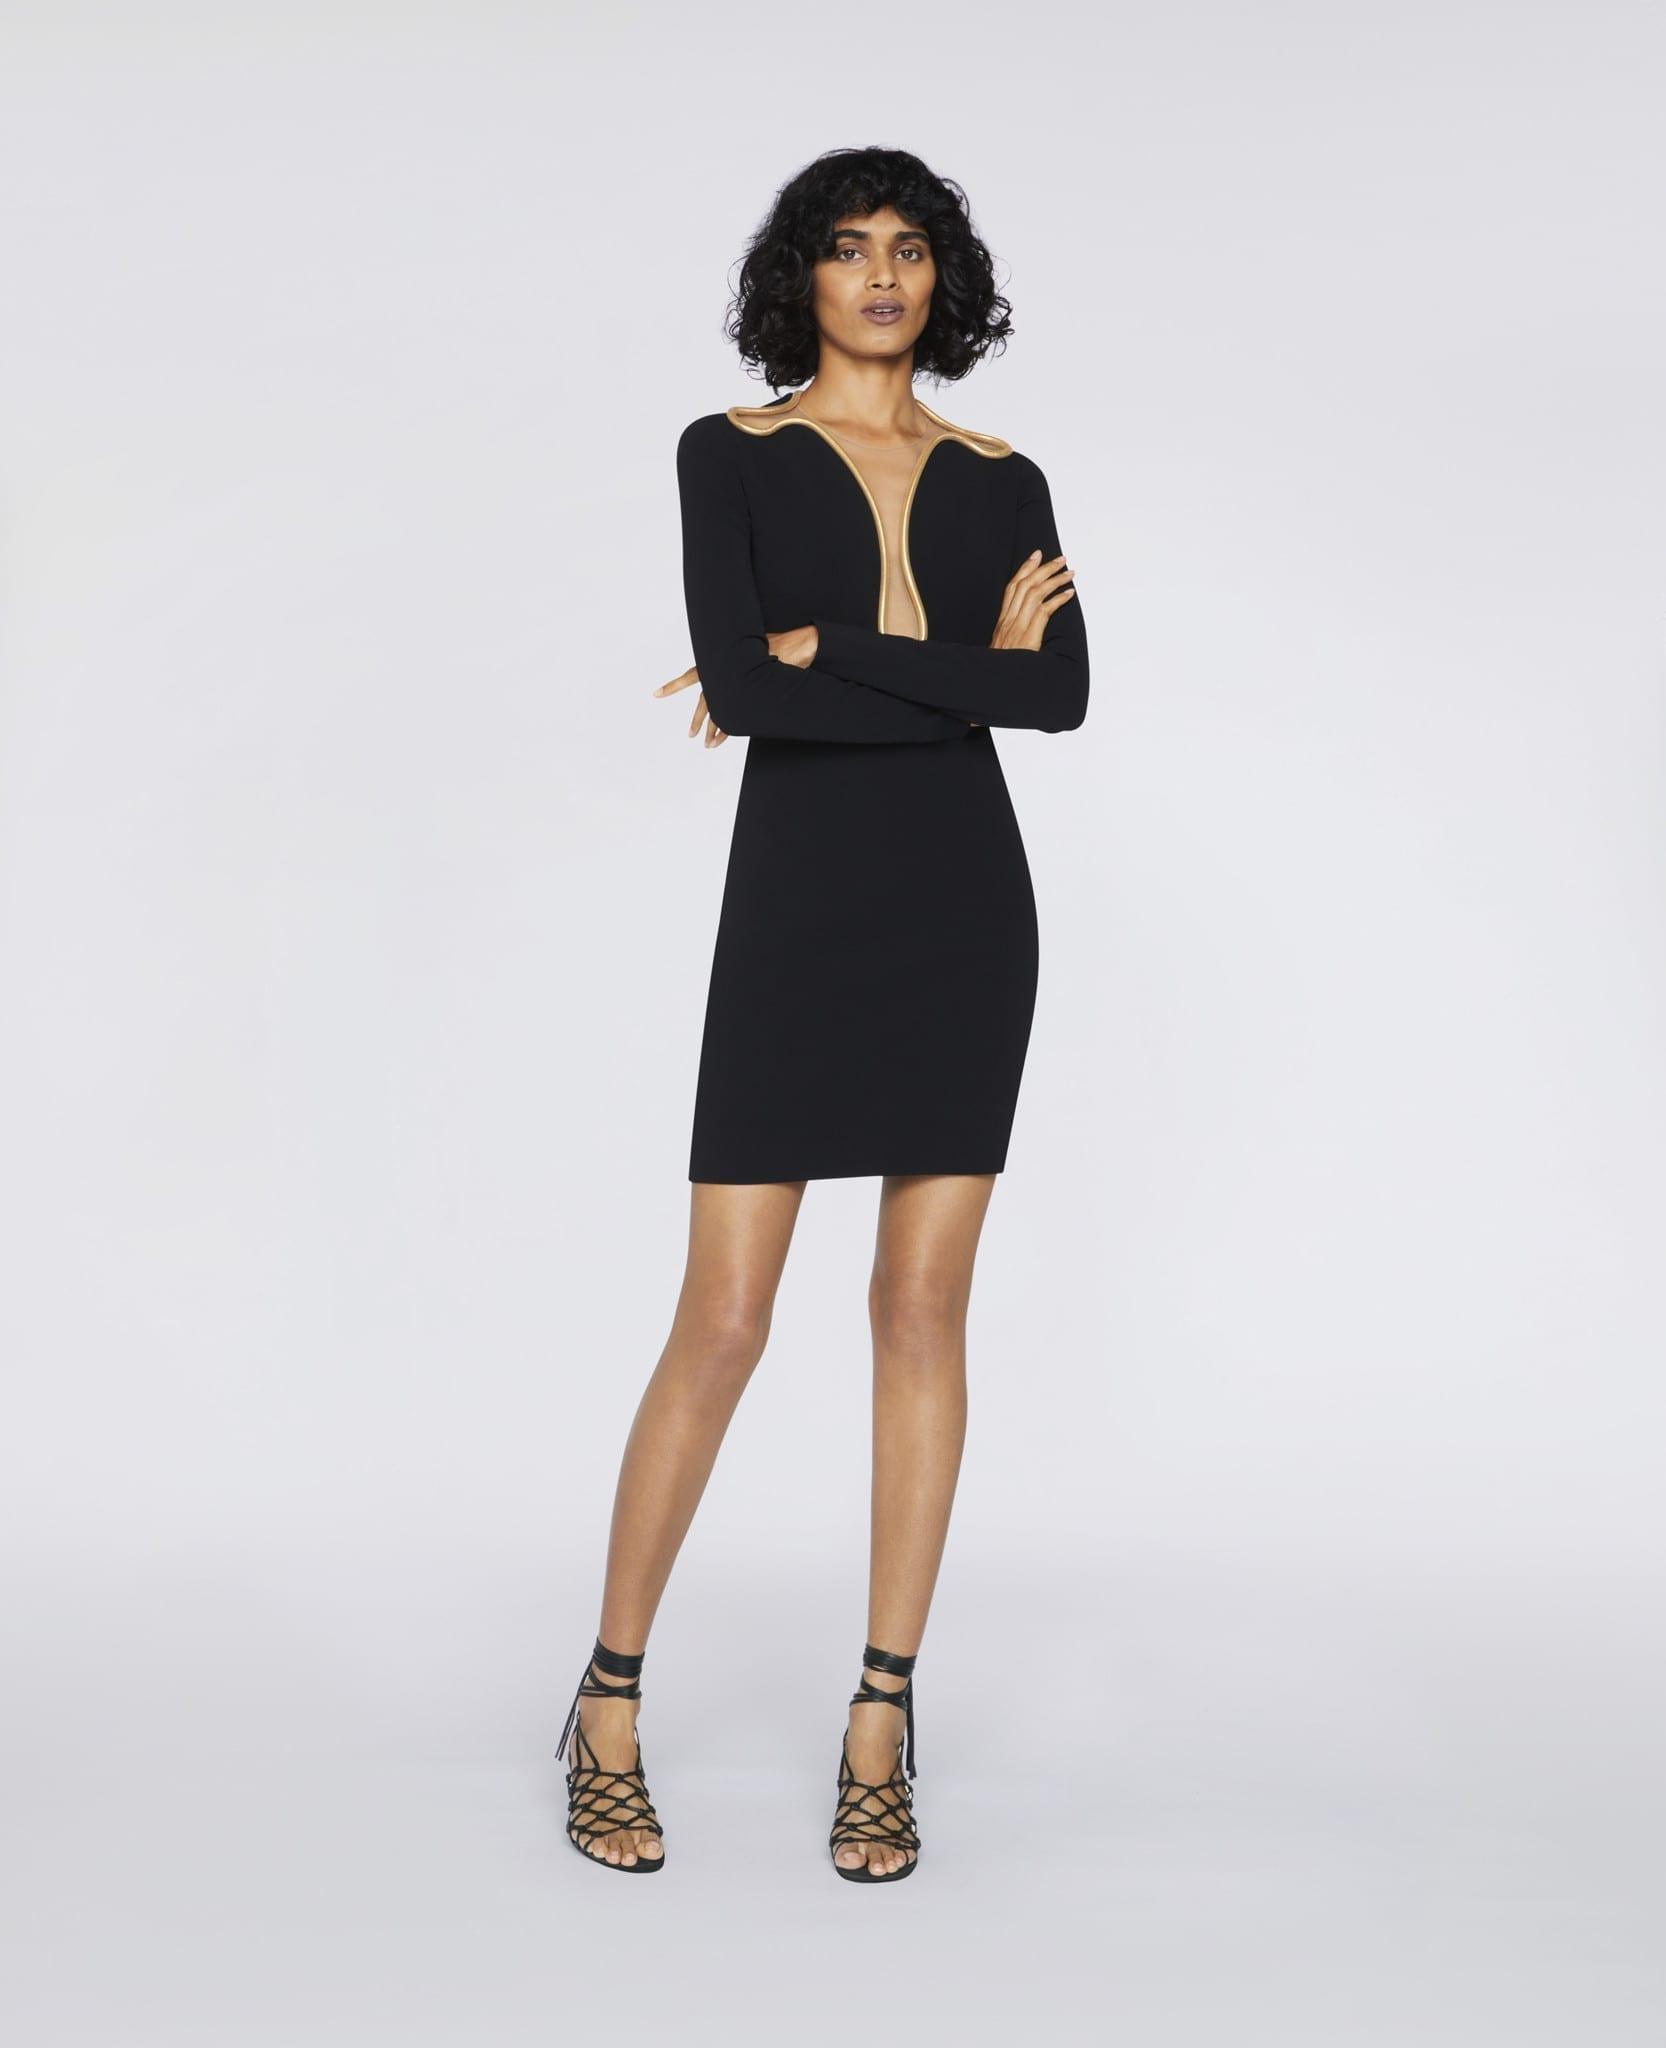 STELLA MCCARTNEY Isabela Dress